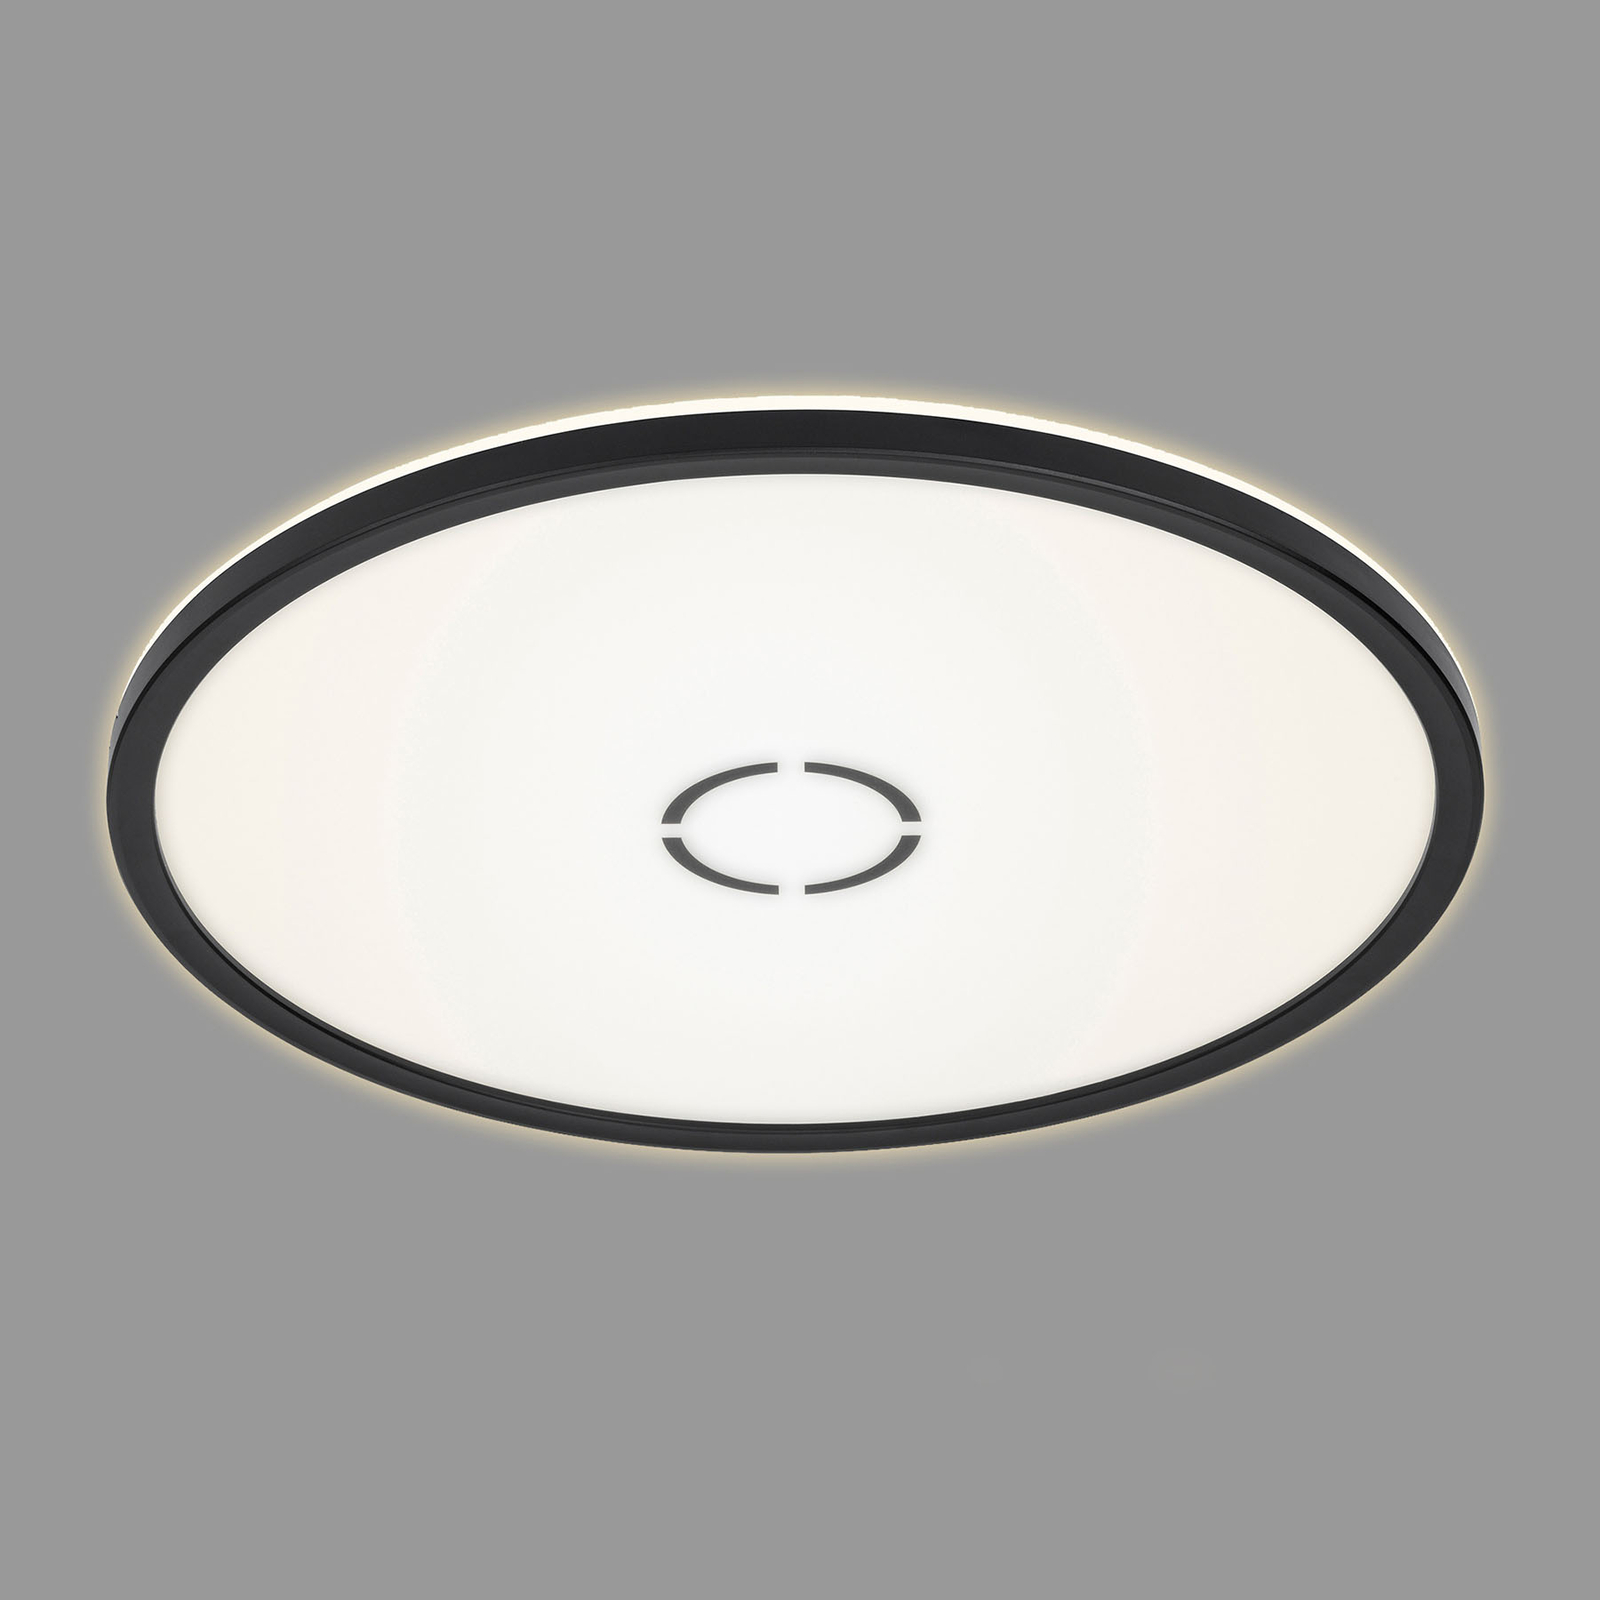 LED-taklampe Free Ø42cm svart